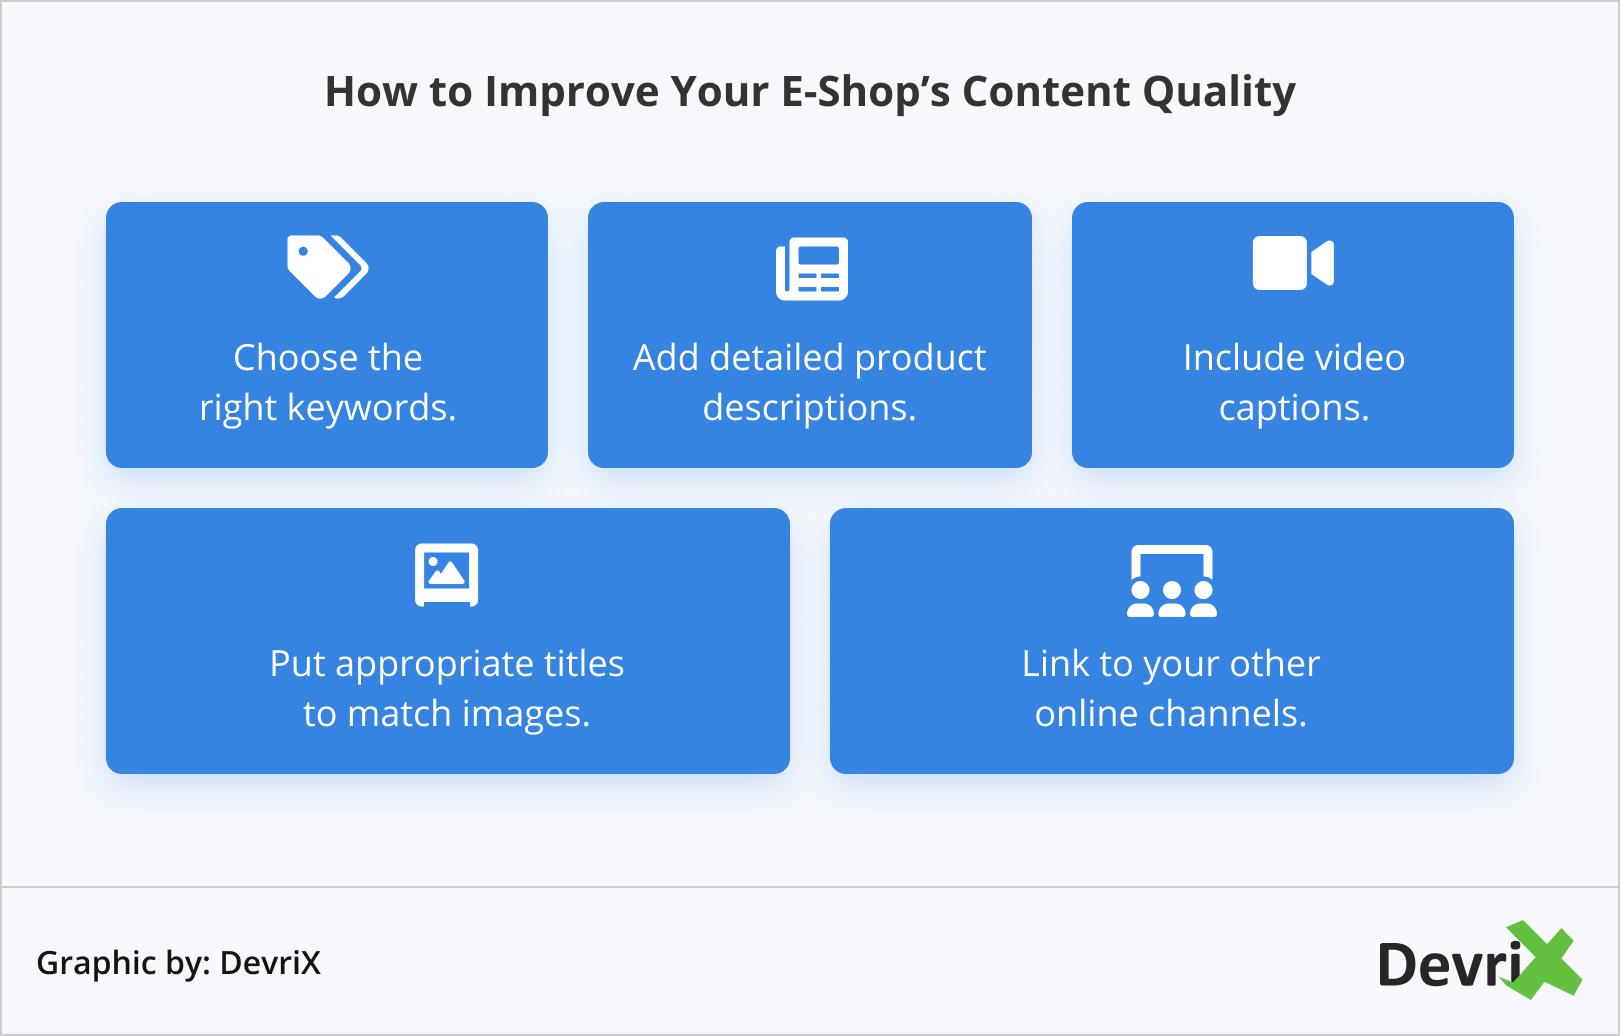 How to Improve Your E-Shop's Content Quality